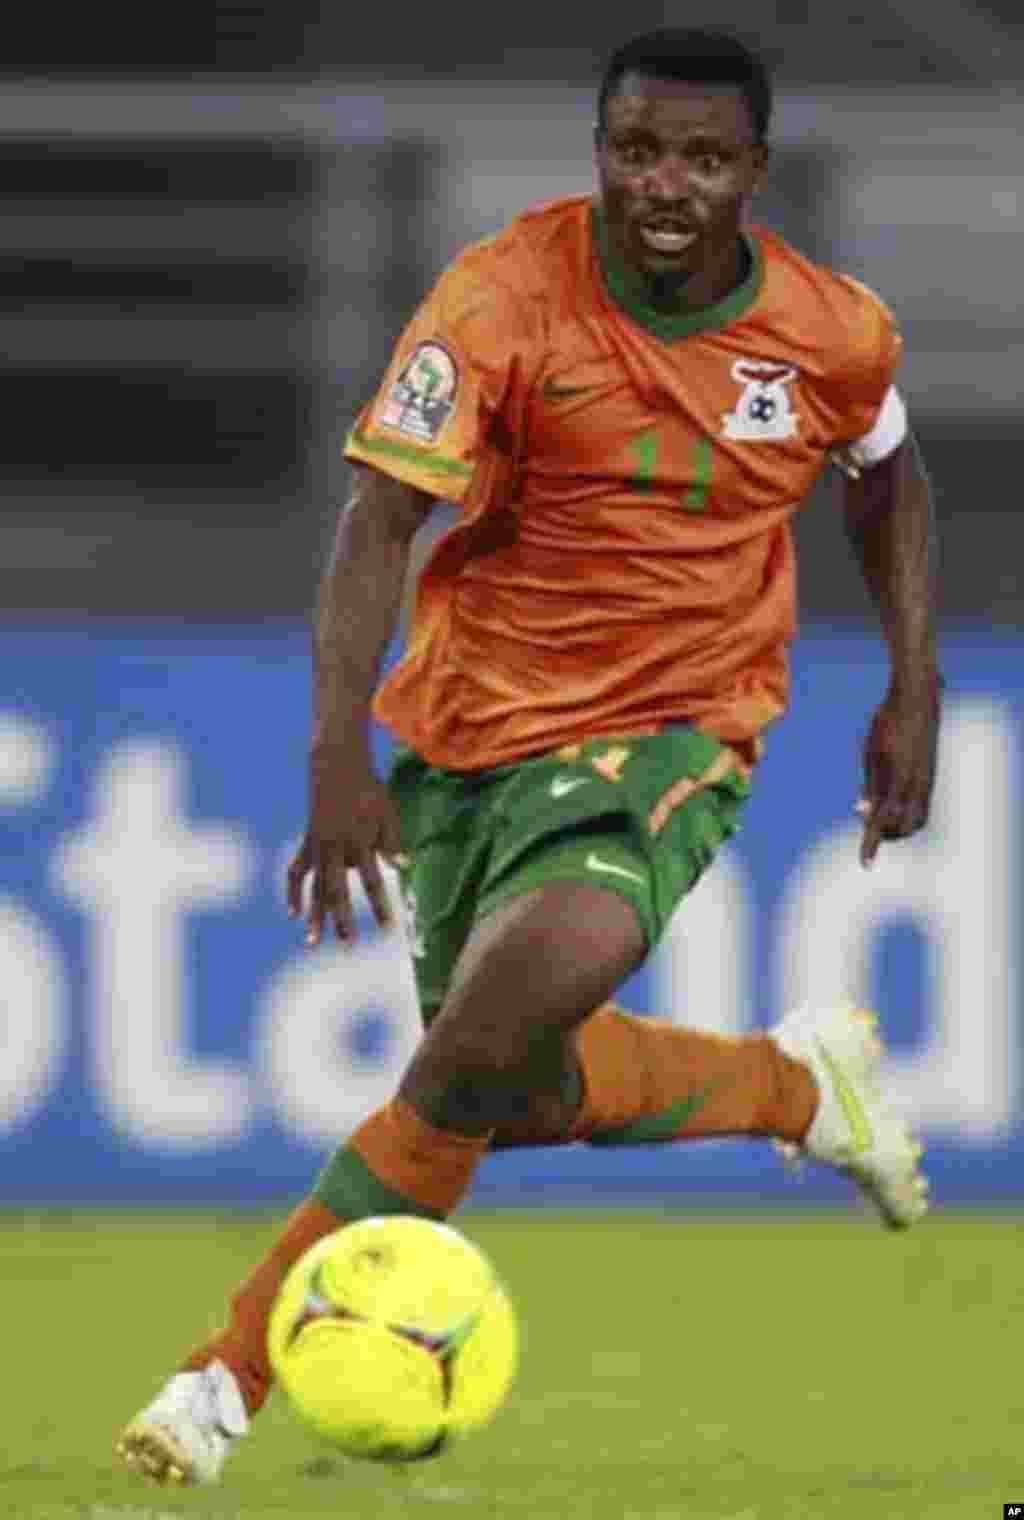 "Zambia's captain Christopher Katongo controls the ball during their African Nations Cup quarter-final soccer match against Sudan at Estadio de Bata ""Bata Stadium"", in Bata February 4, 2012."